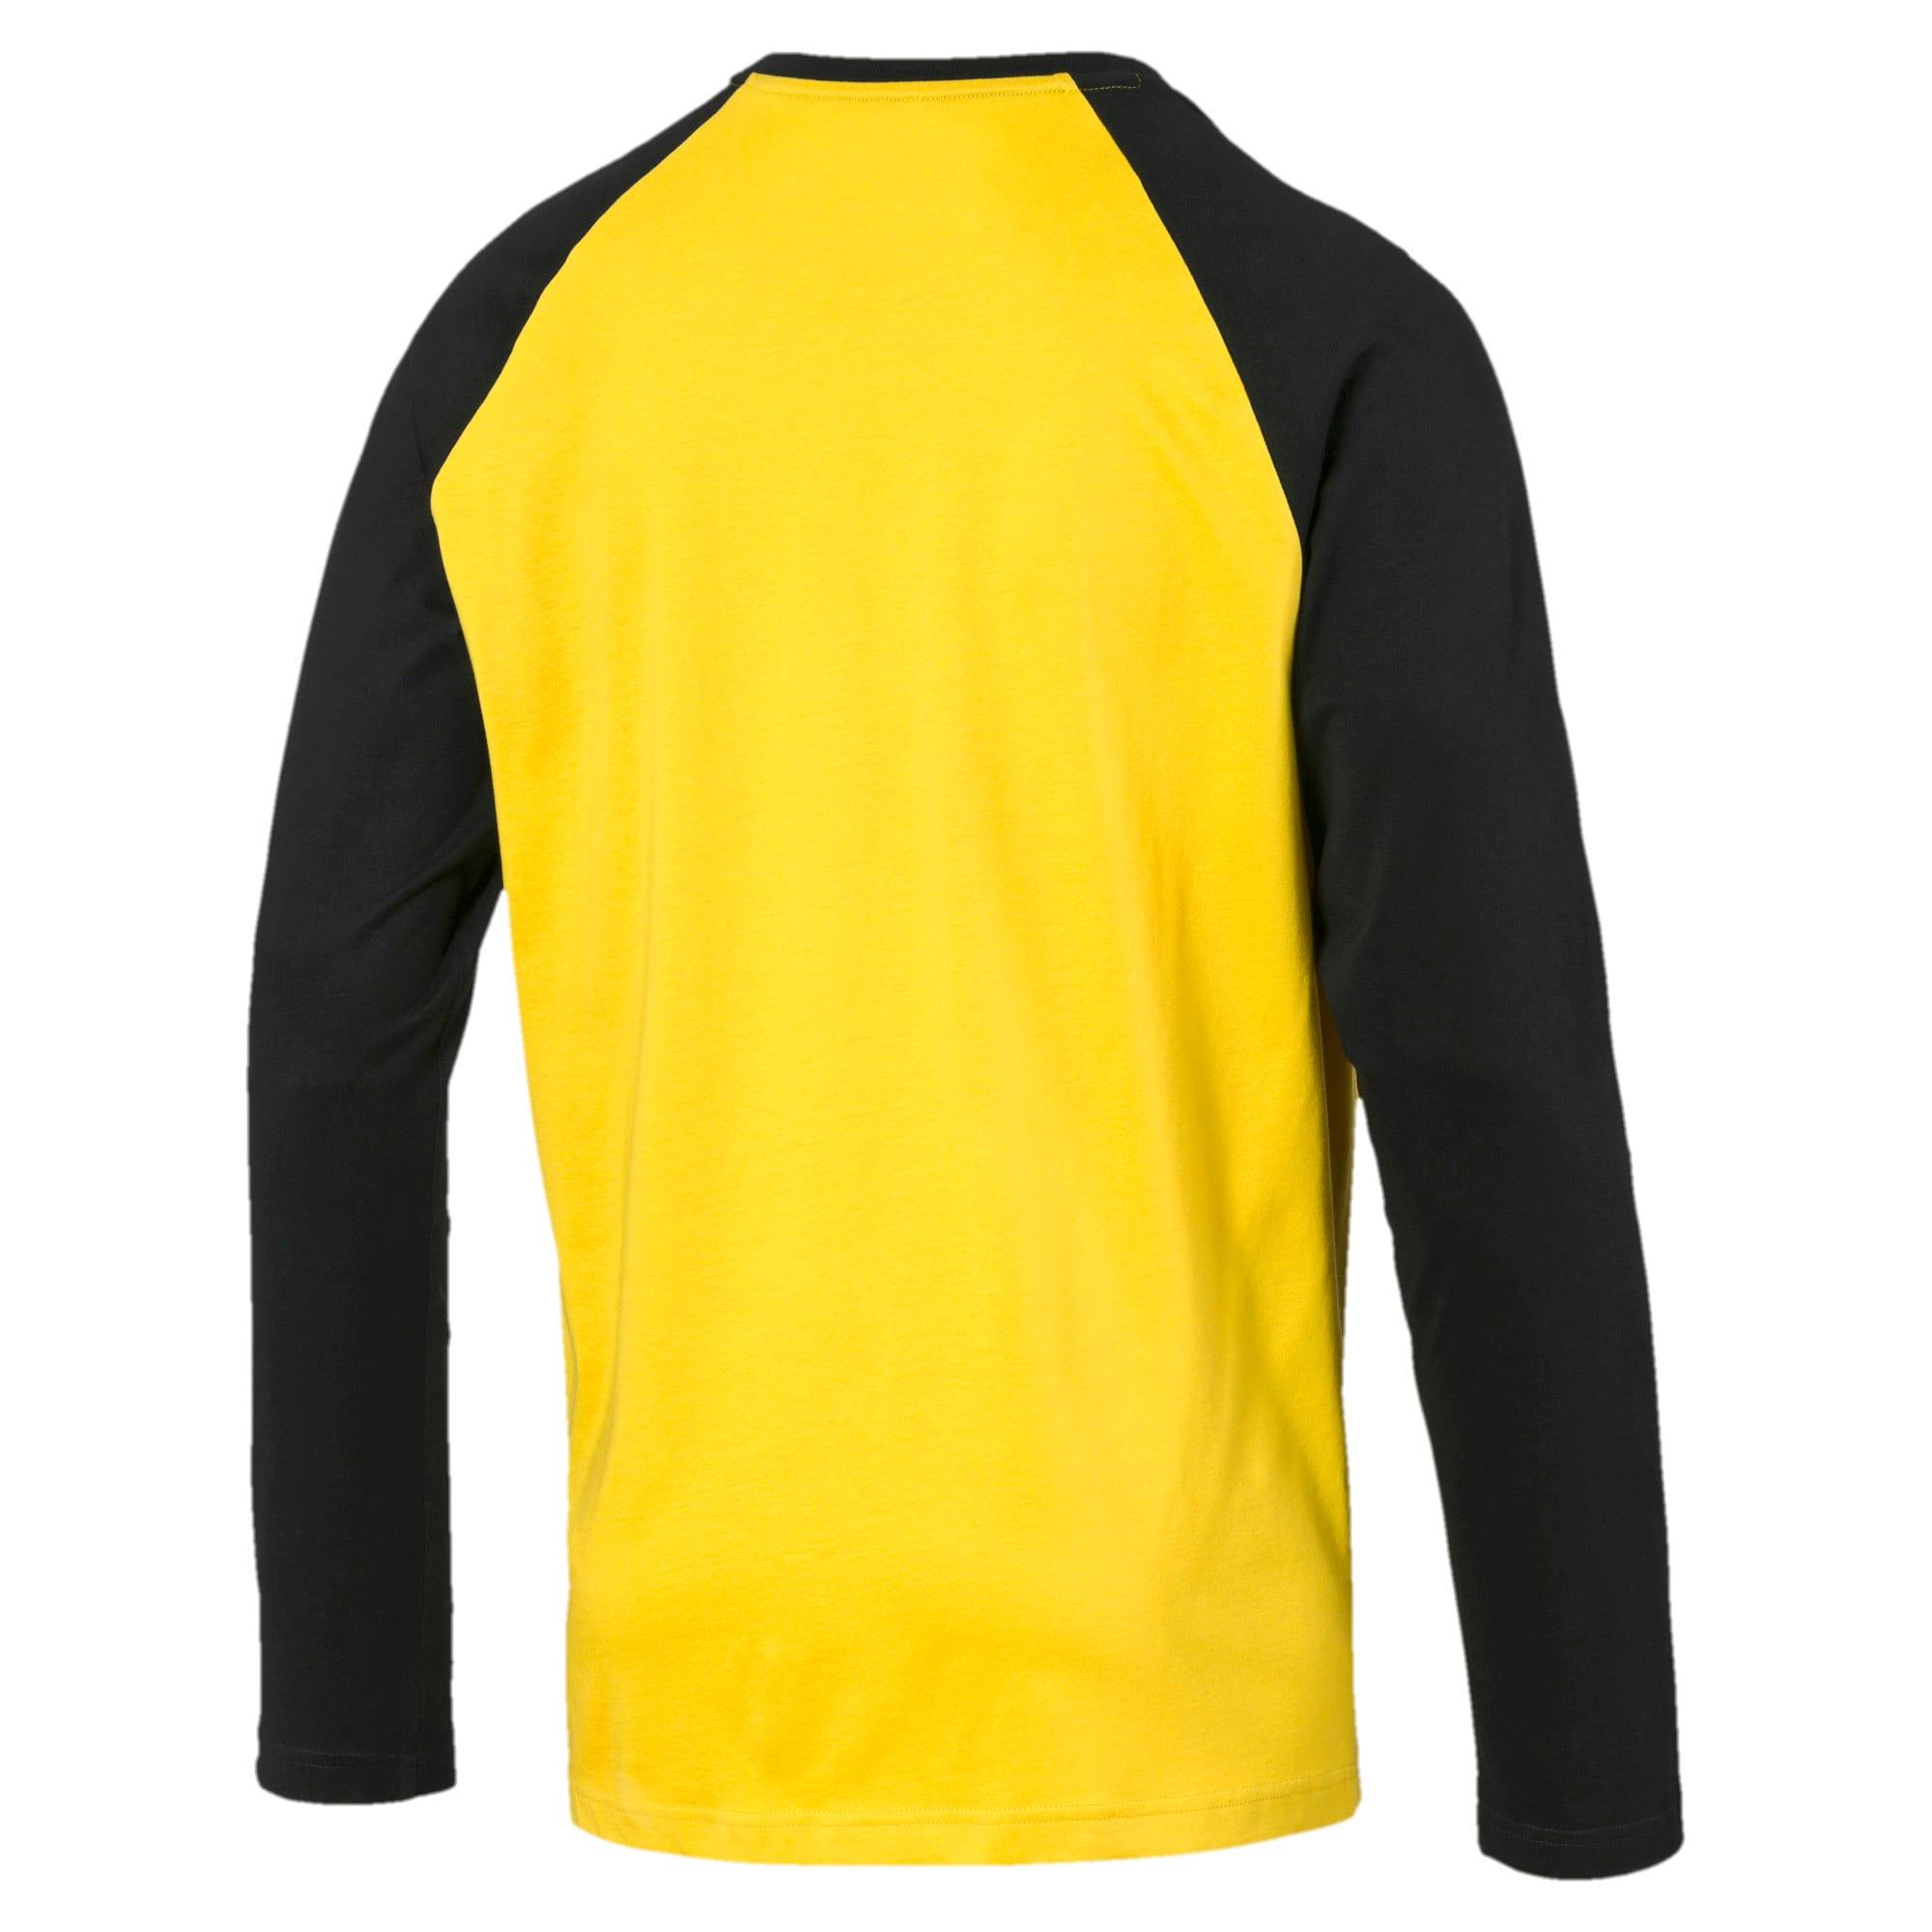 Thumbnail 5 of Modern Sports Men's Long Sleeve Tee, Sulphur, medium